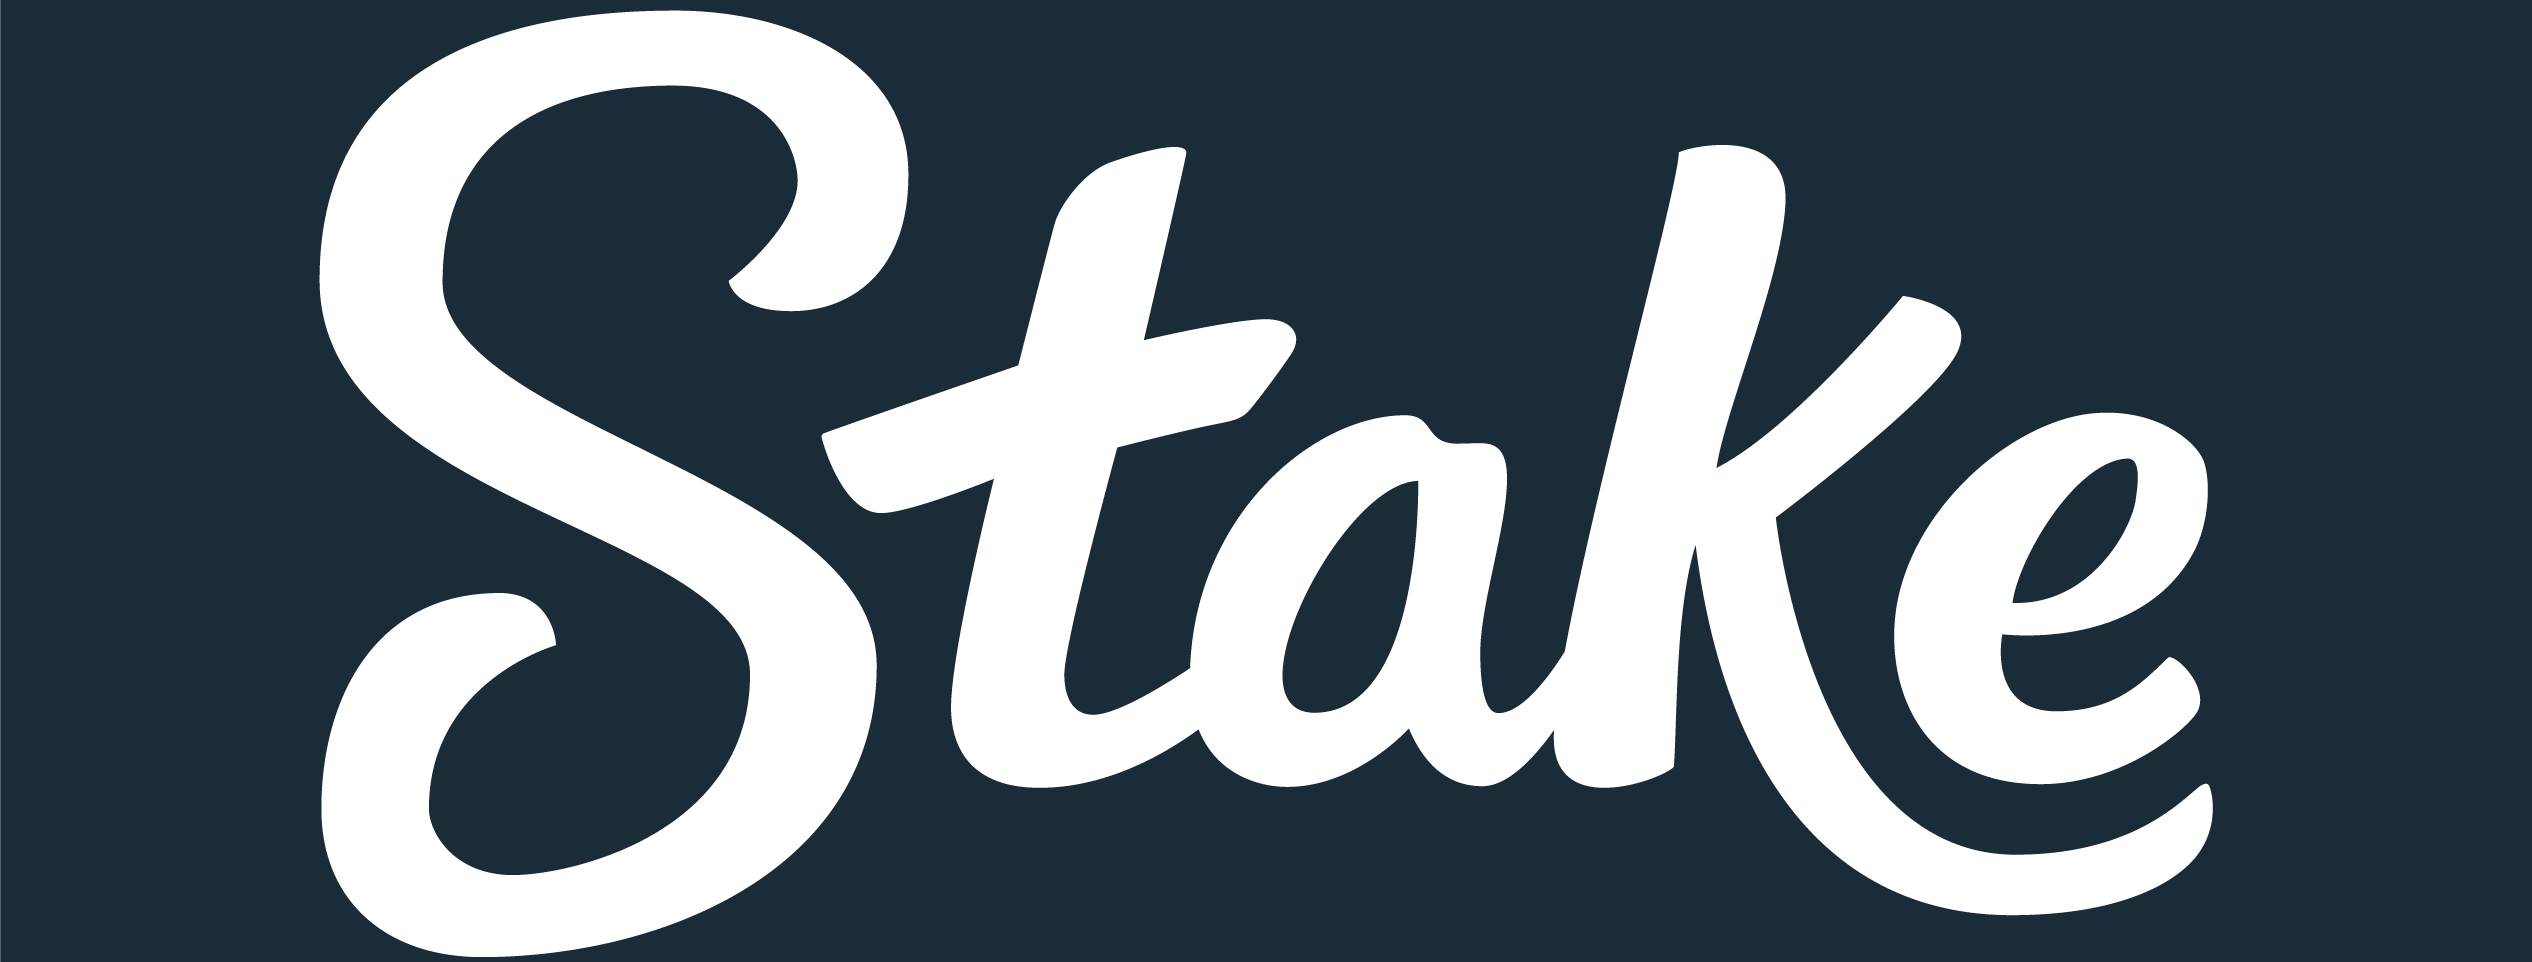 Stake-casino.fr - Le meilleur casino